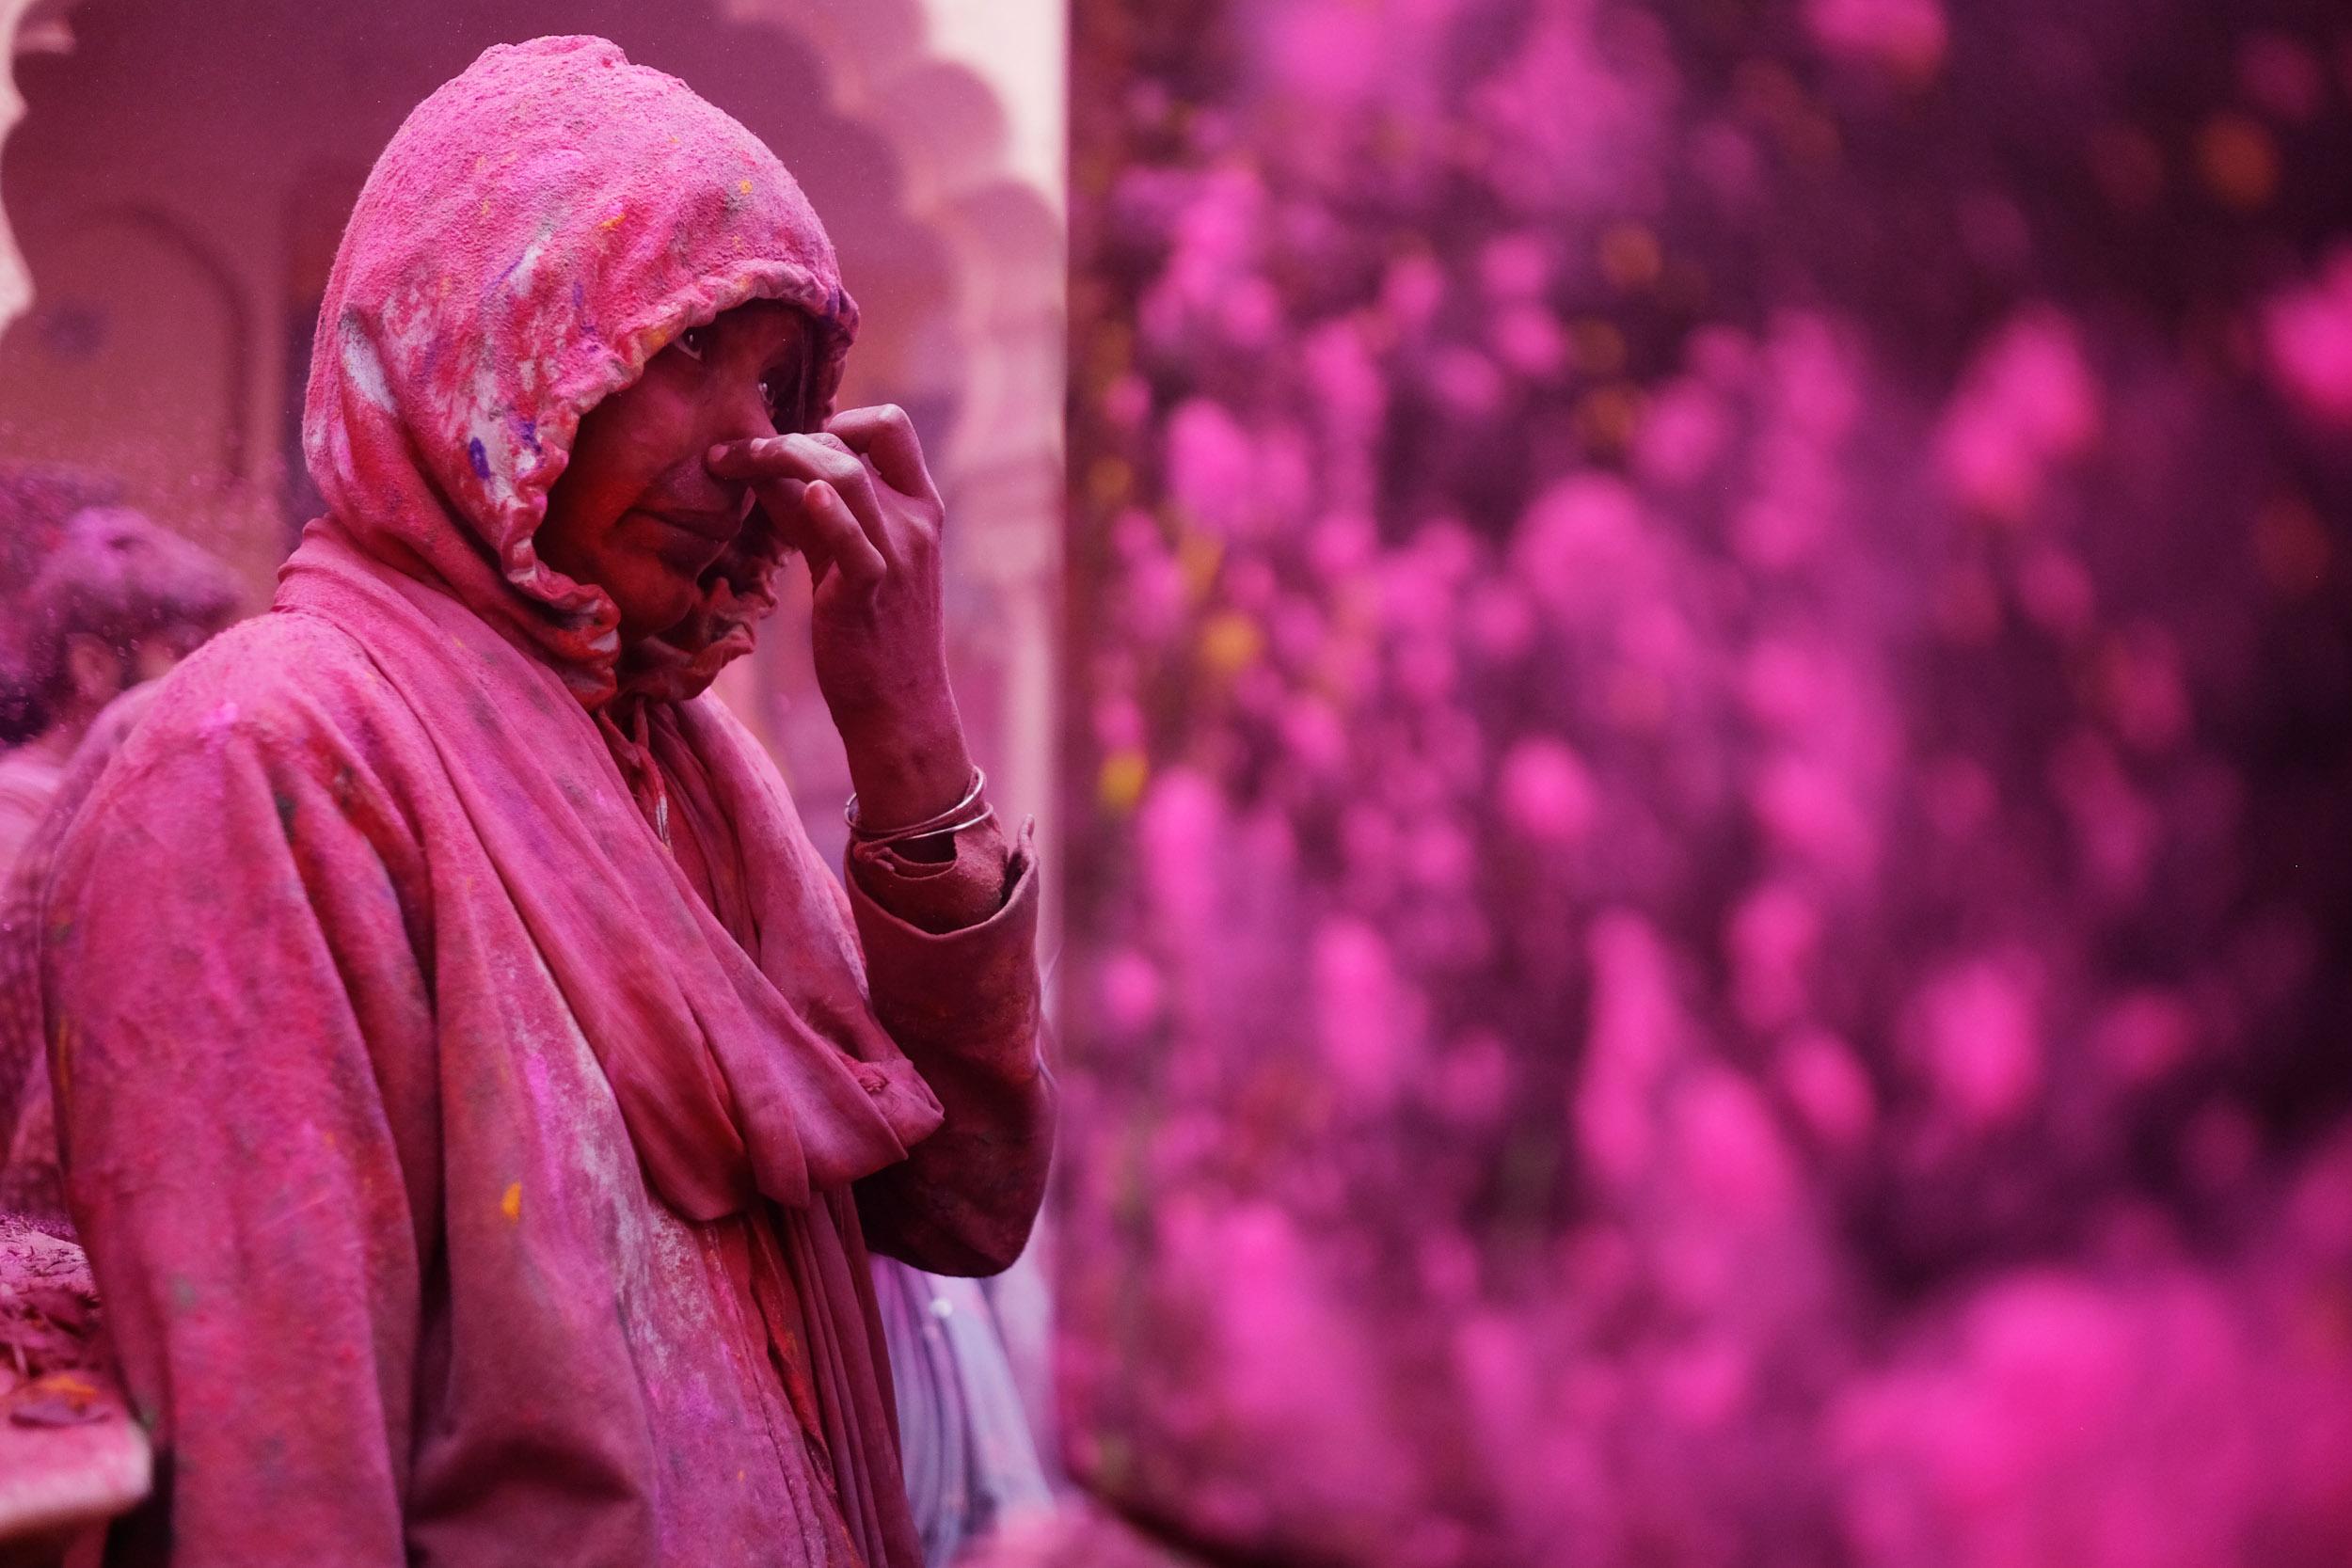 Sindhur_Photography_Travel_People_Holi-9.JPG